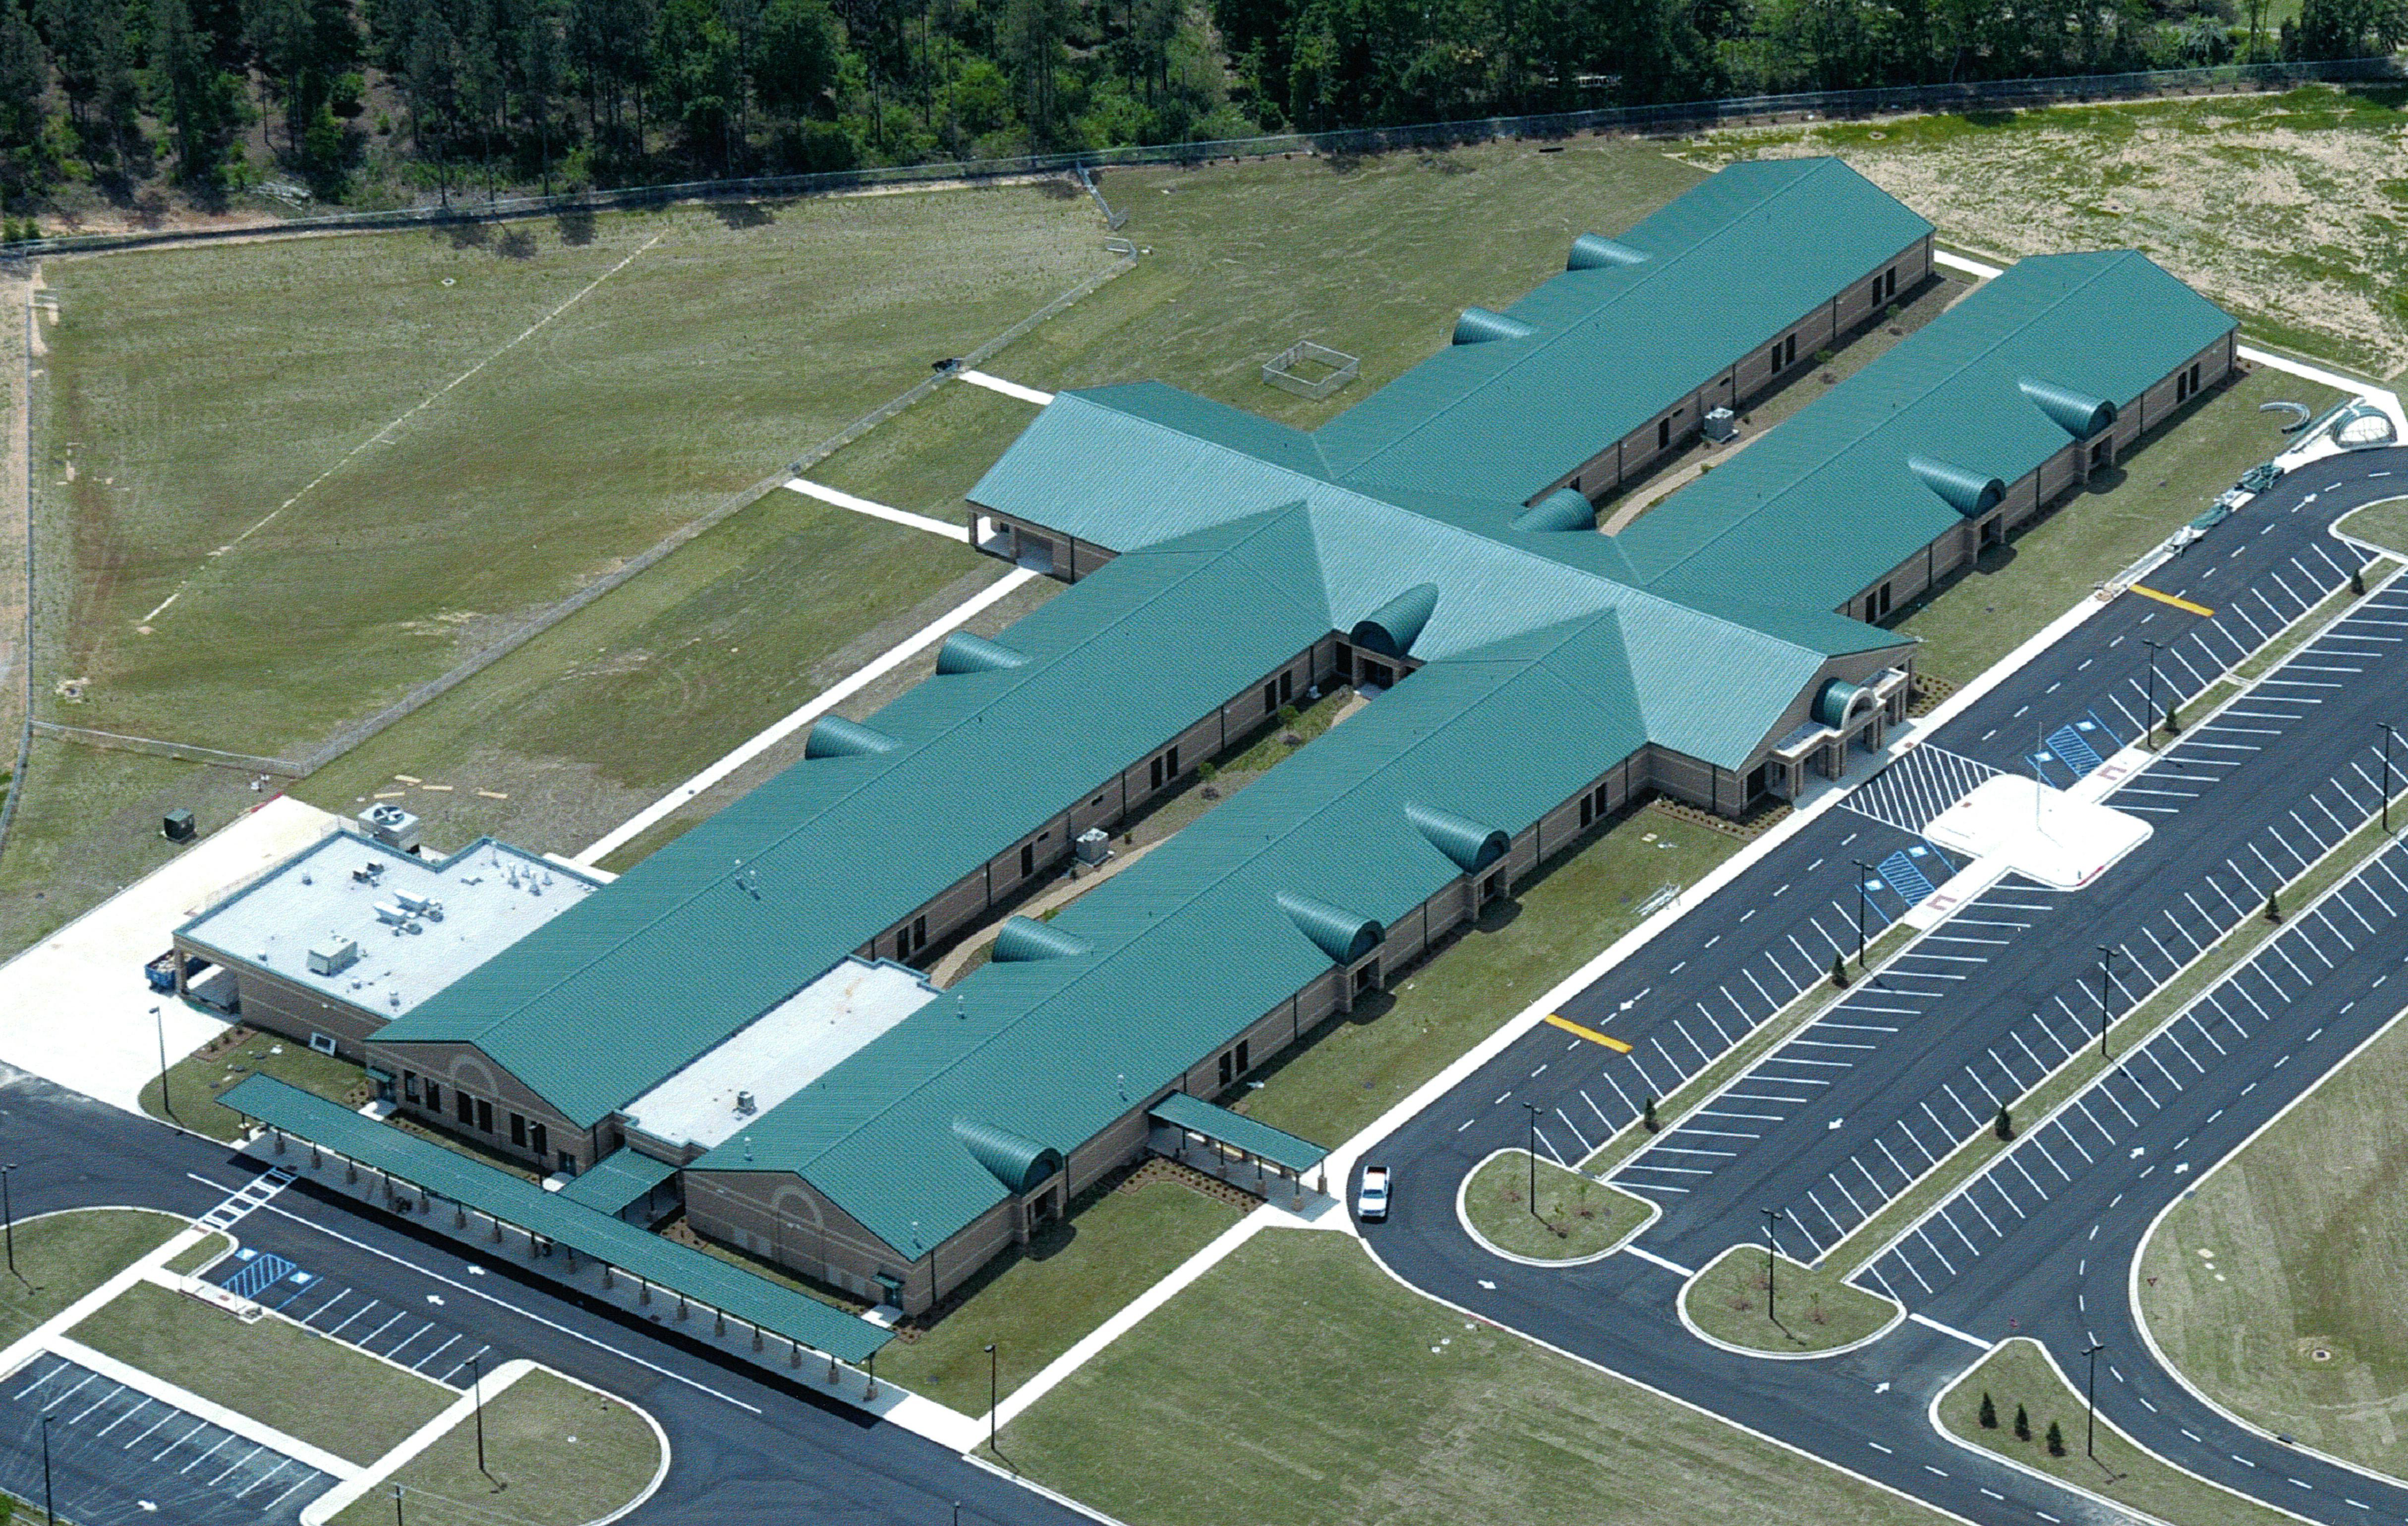 jackson elementary